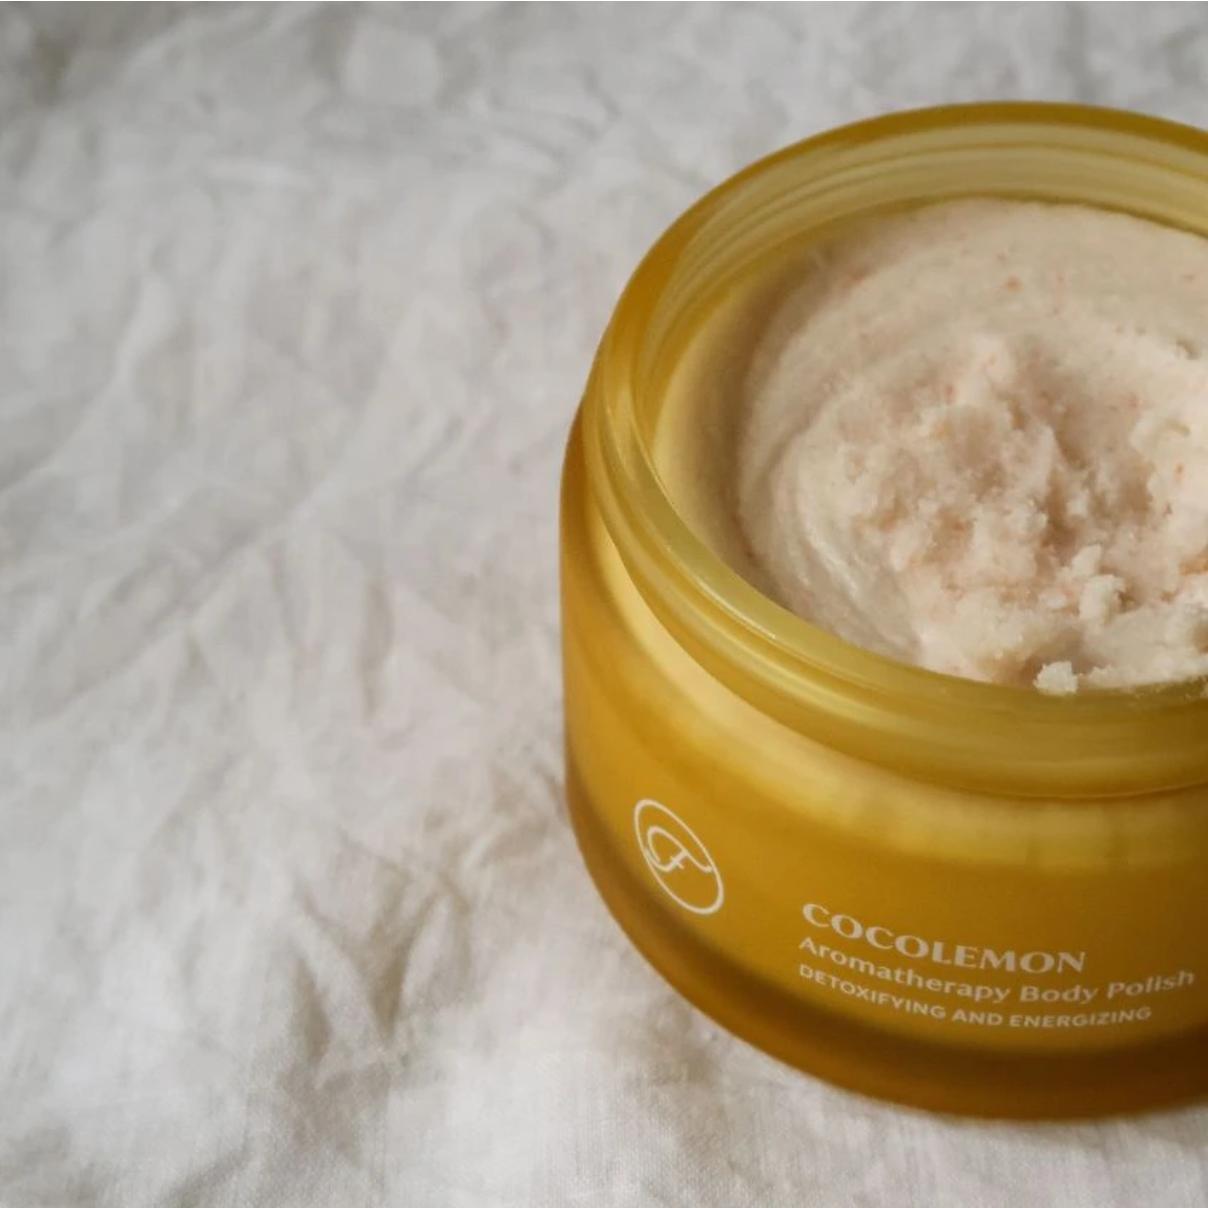 Coco Lemon Aromatherapy Body Polish - Flow Cosmetics-2